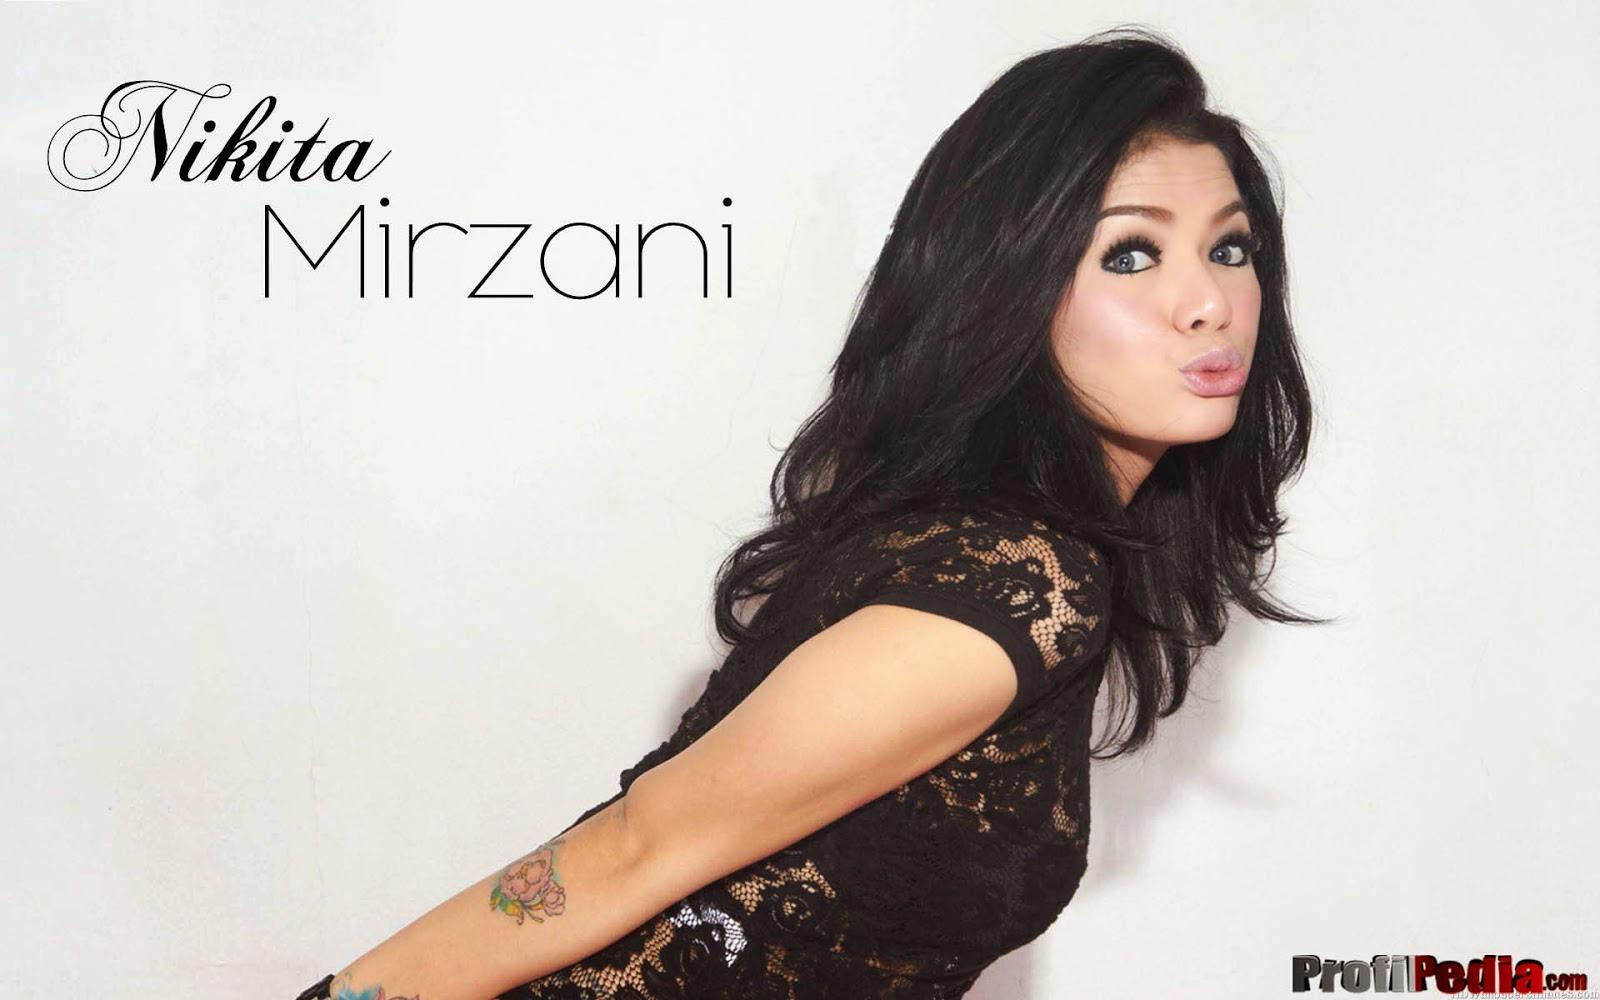 Streaming Nikita Mirzani Bugil